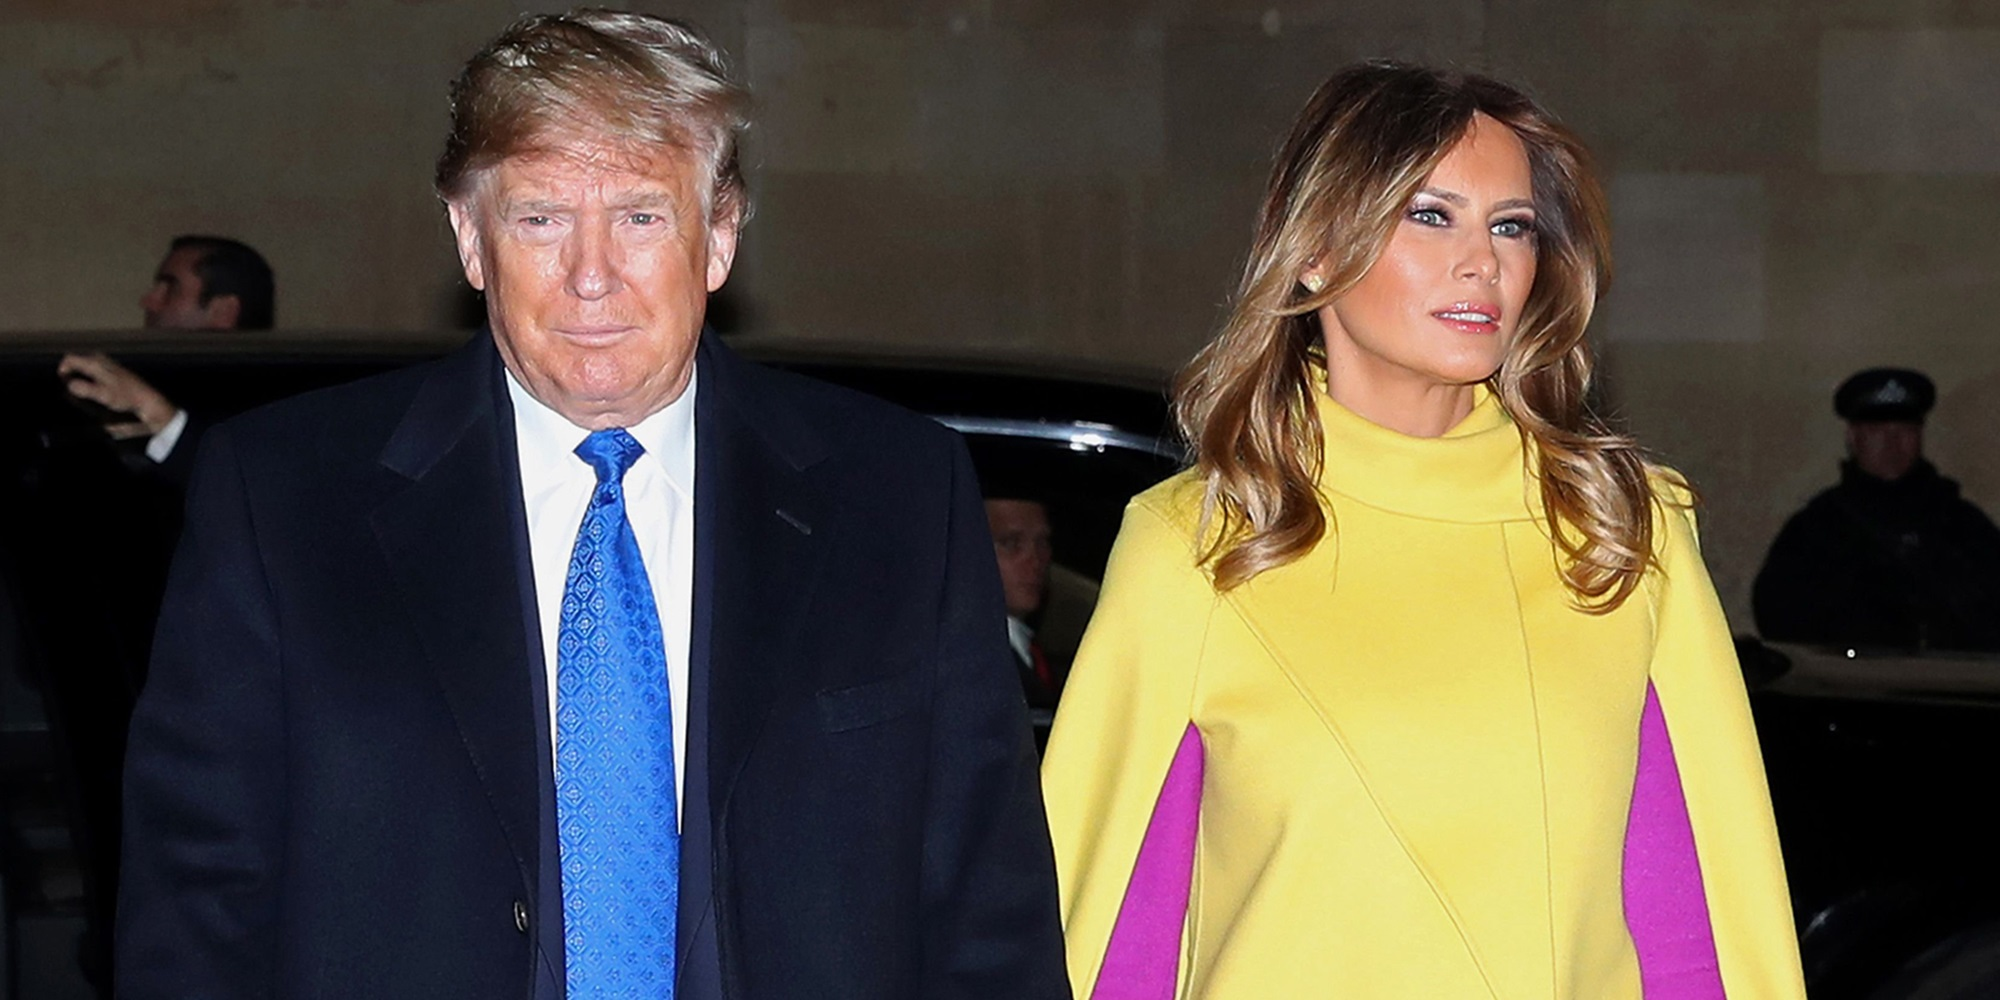 Melania Trump Angrily Defends Son Barron Trump But Stays ...